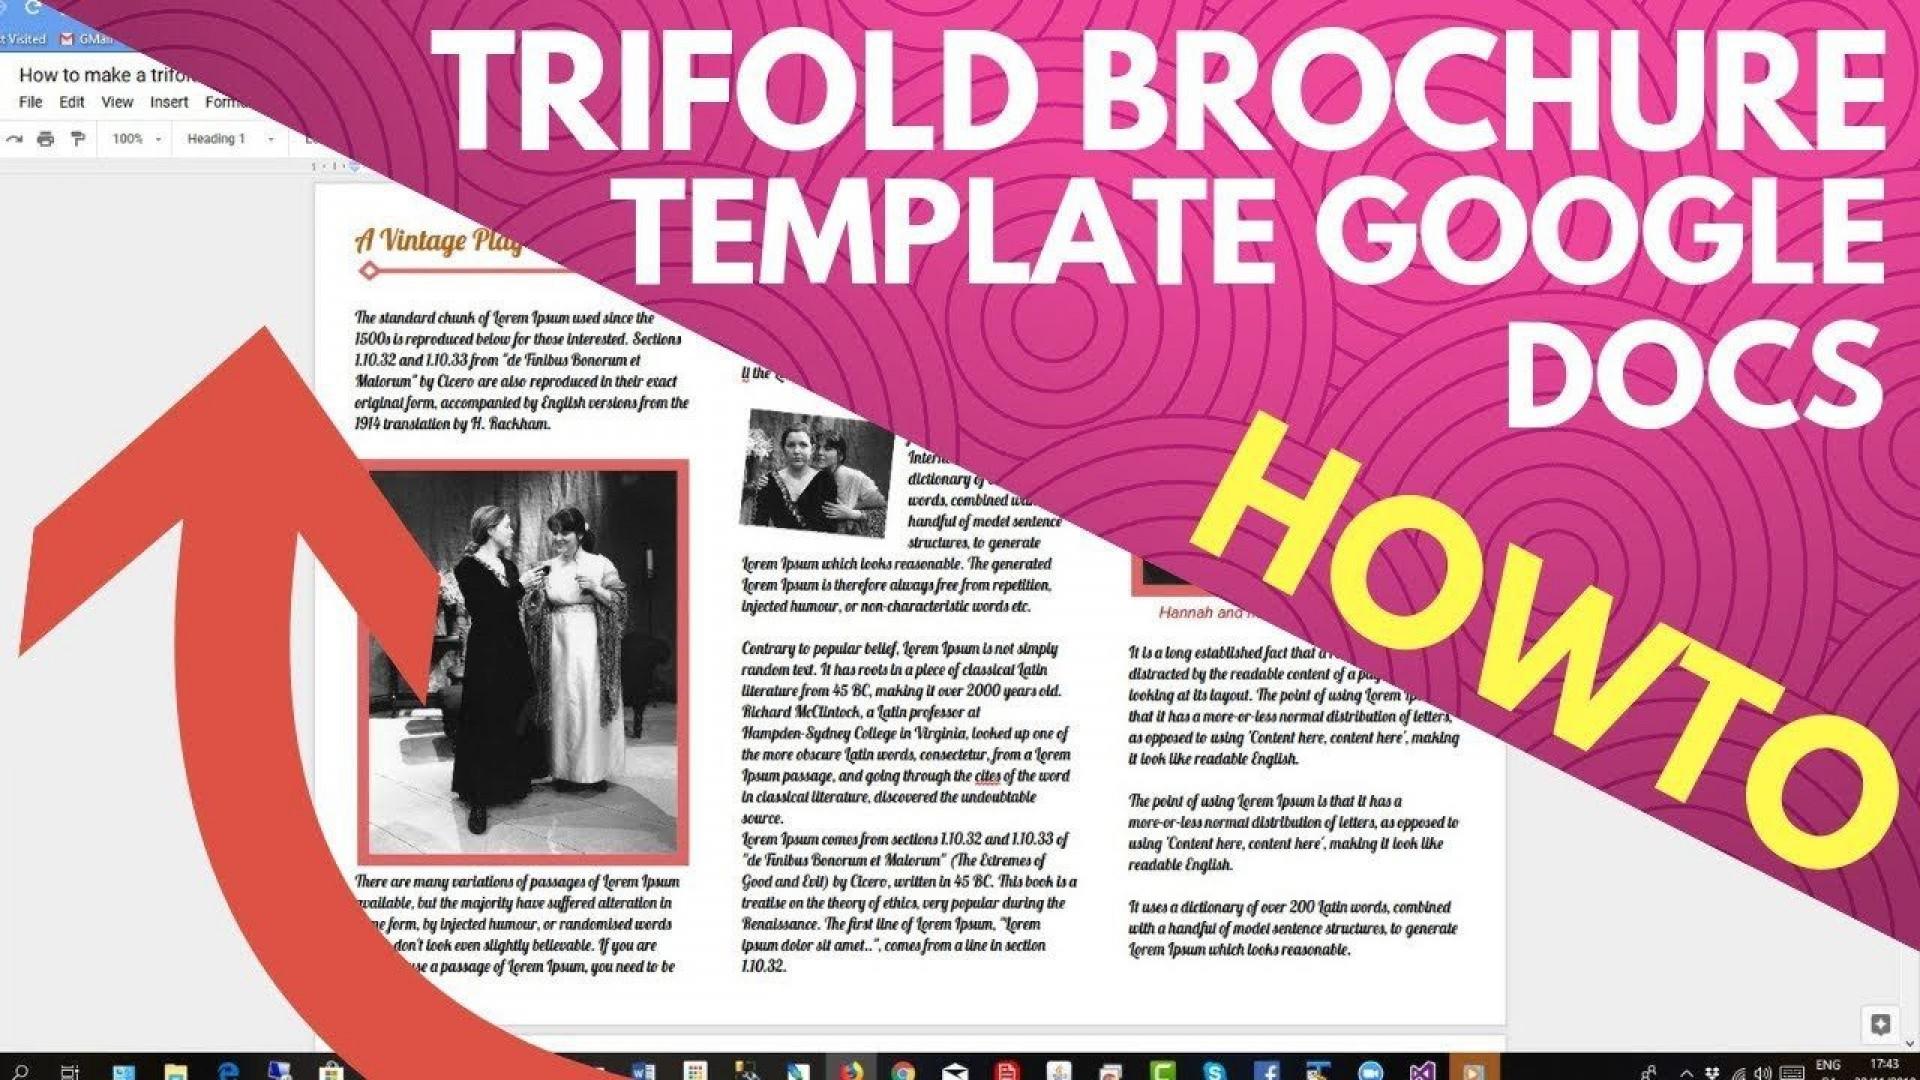 007 Beautiful Brochure Template For Google Doc Photo  Docs Free 3 Panel Tri Fold1920